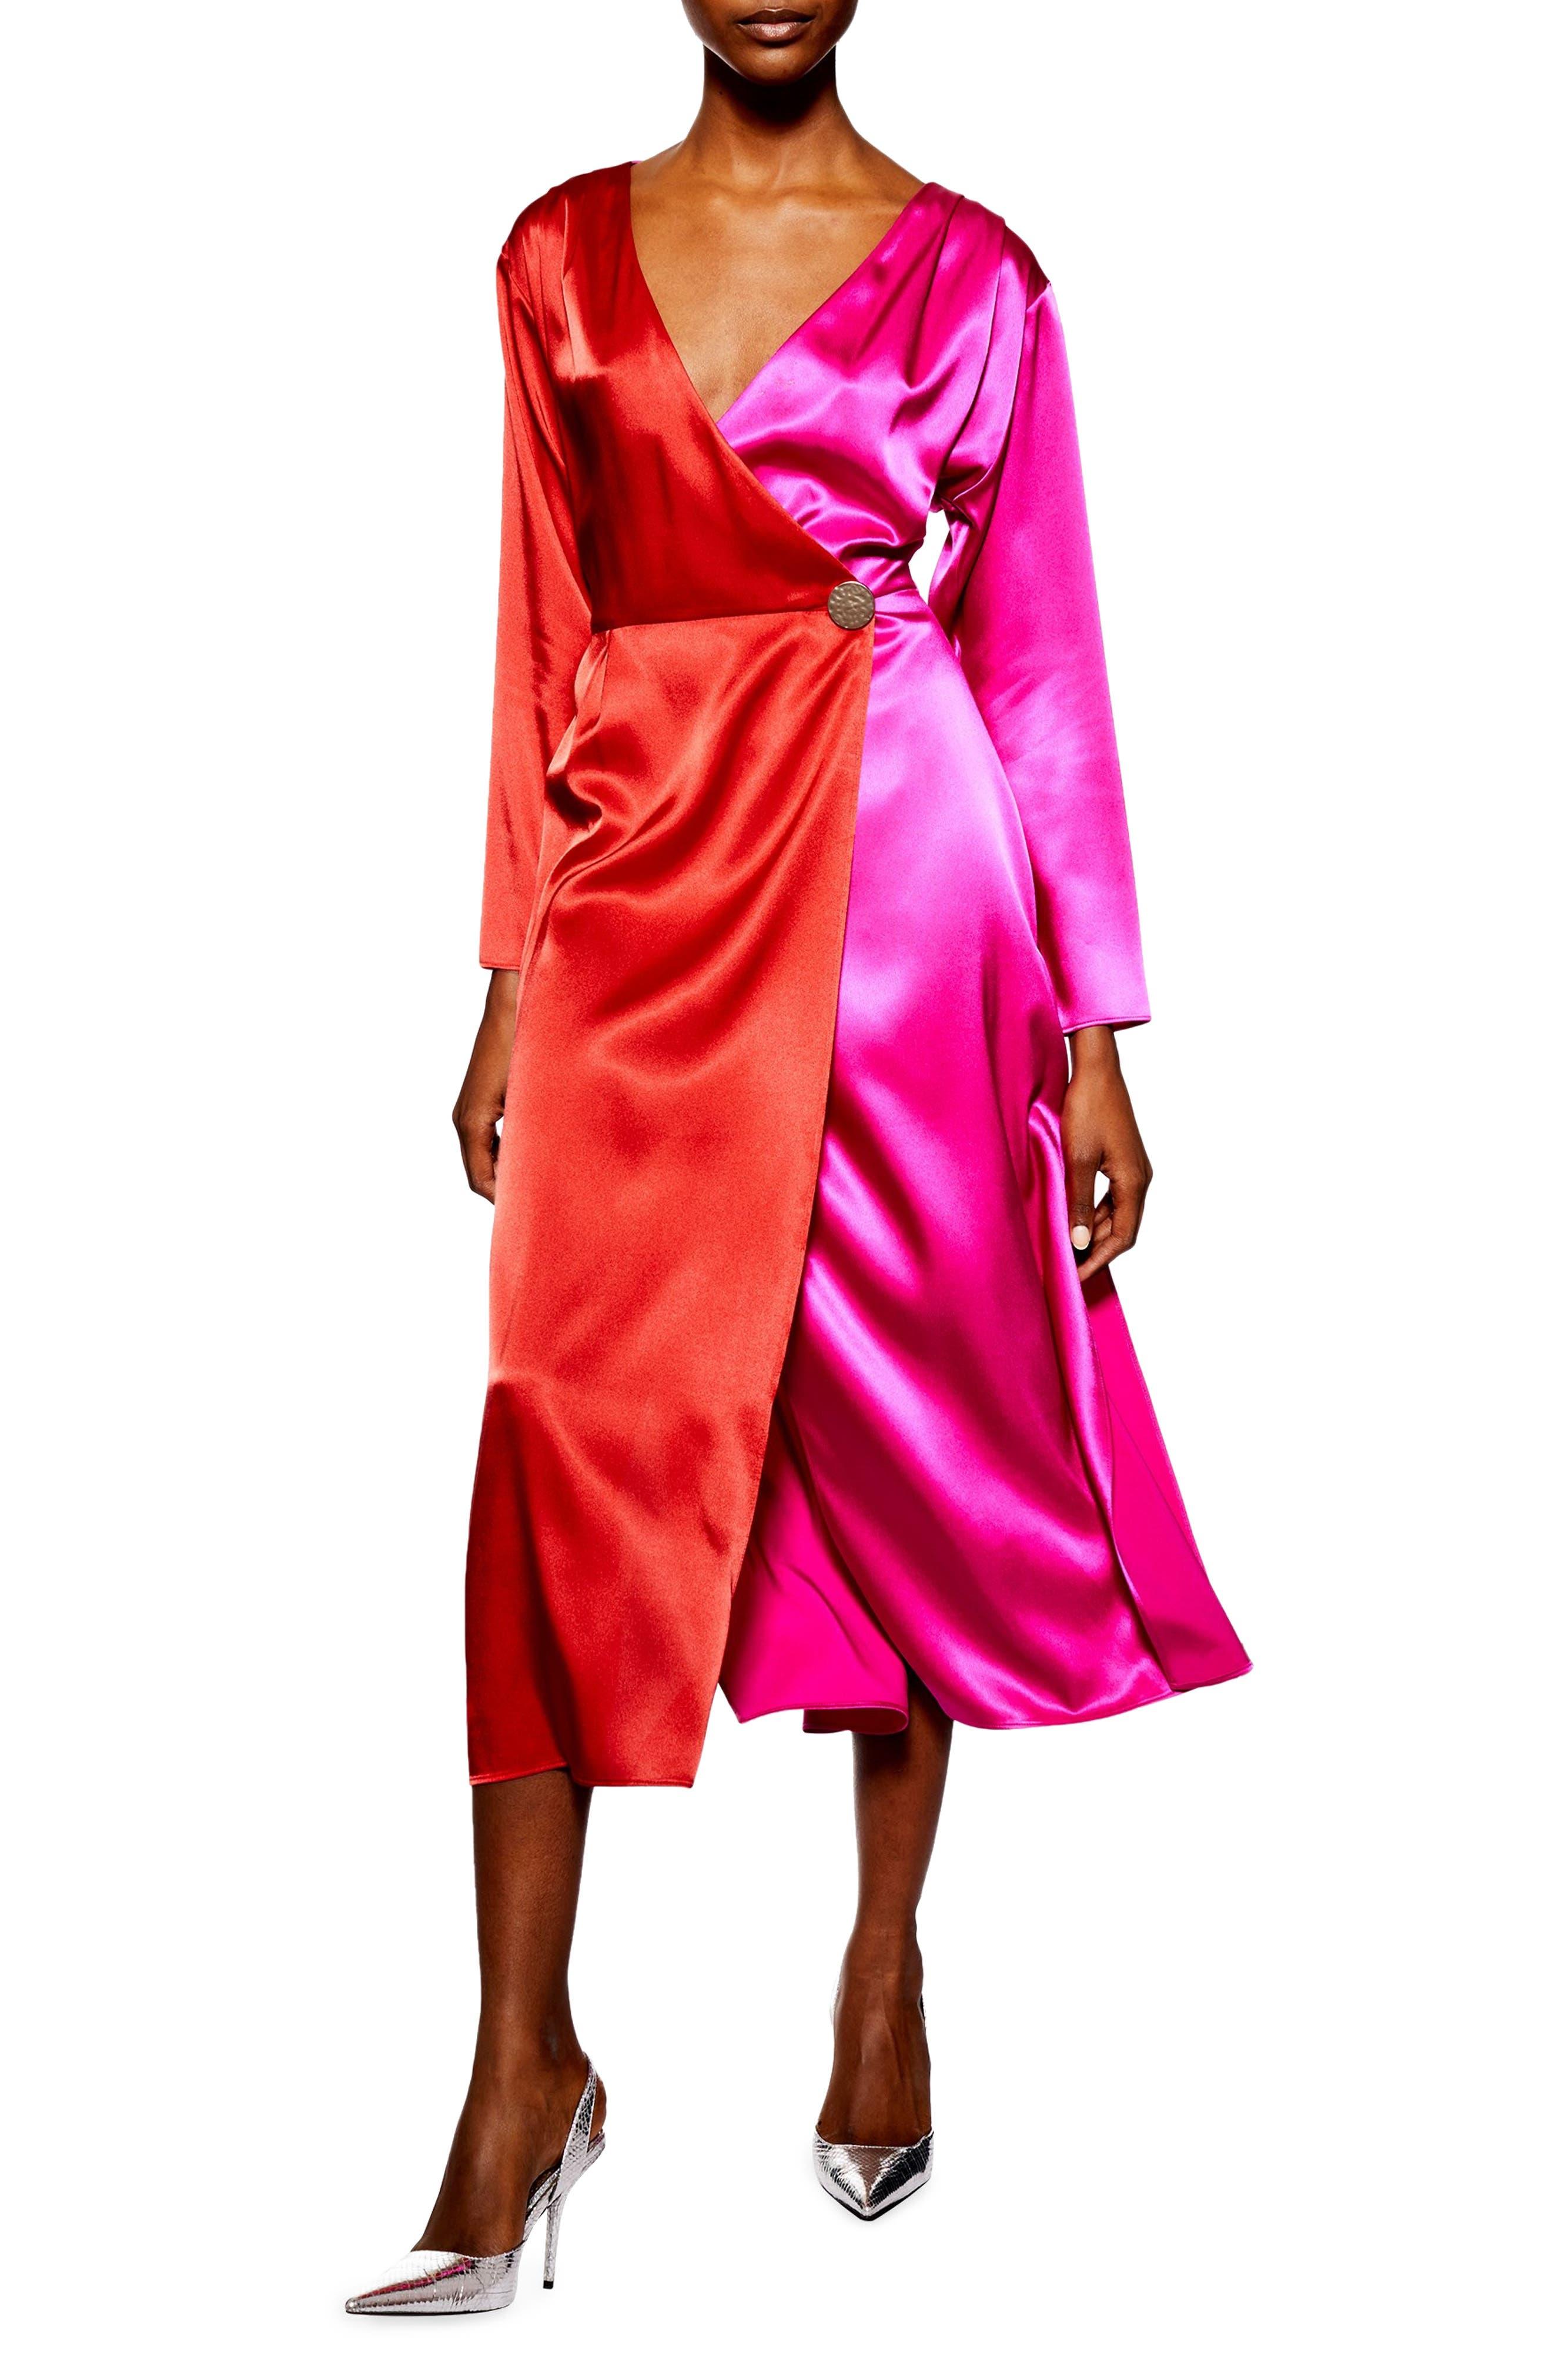 TOPSHOP,                             Colorblock Dress,                             Main thumbnail 1, color,                             PINK MULTI